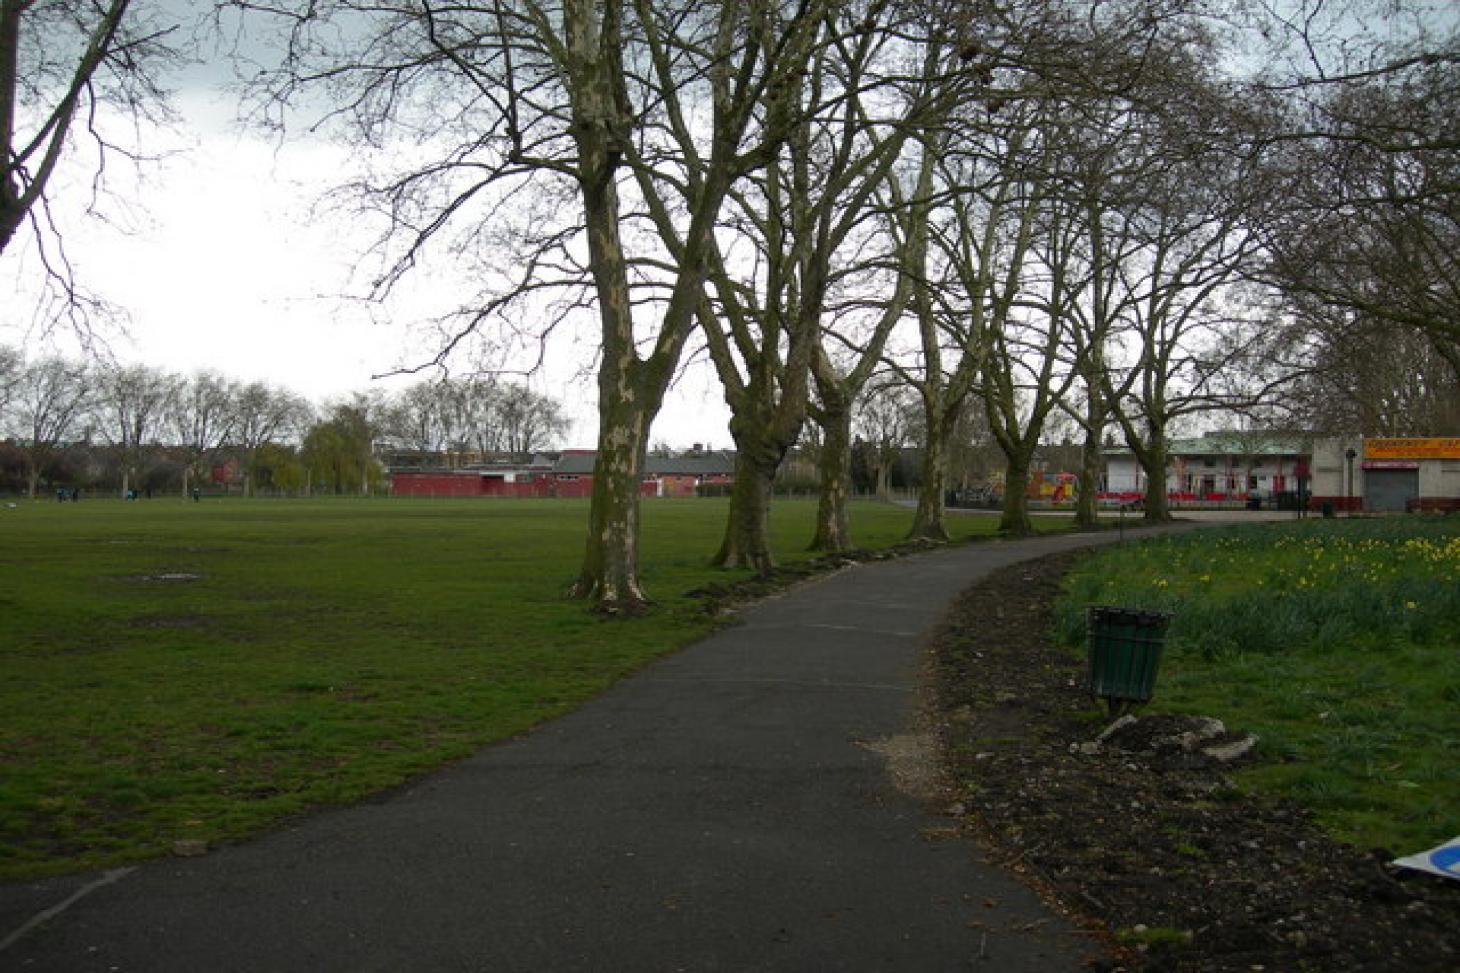 Chestnuts Park 5 a side | Concrete football pitch